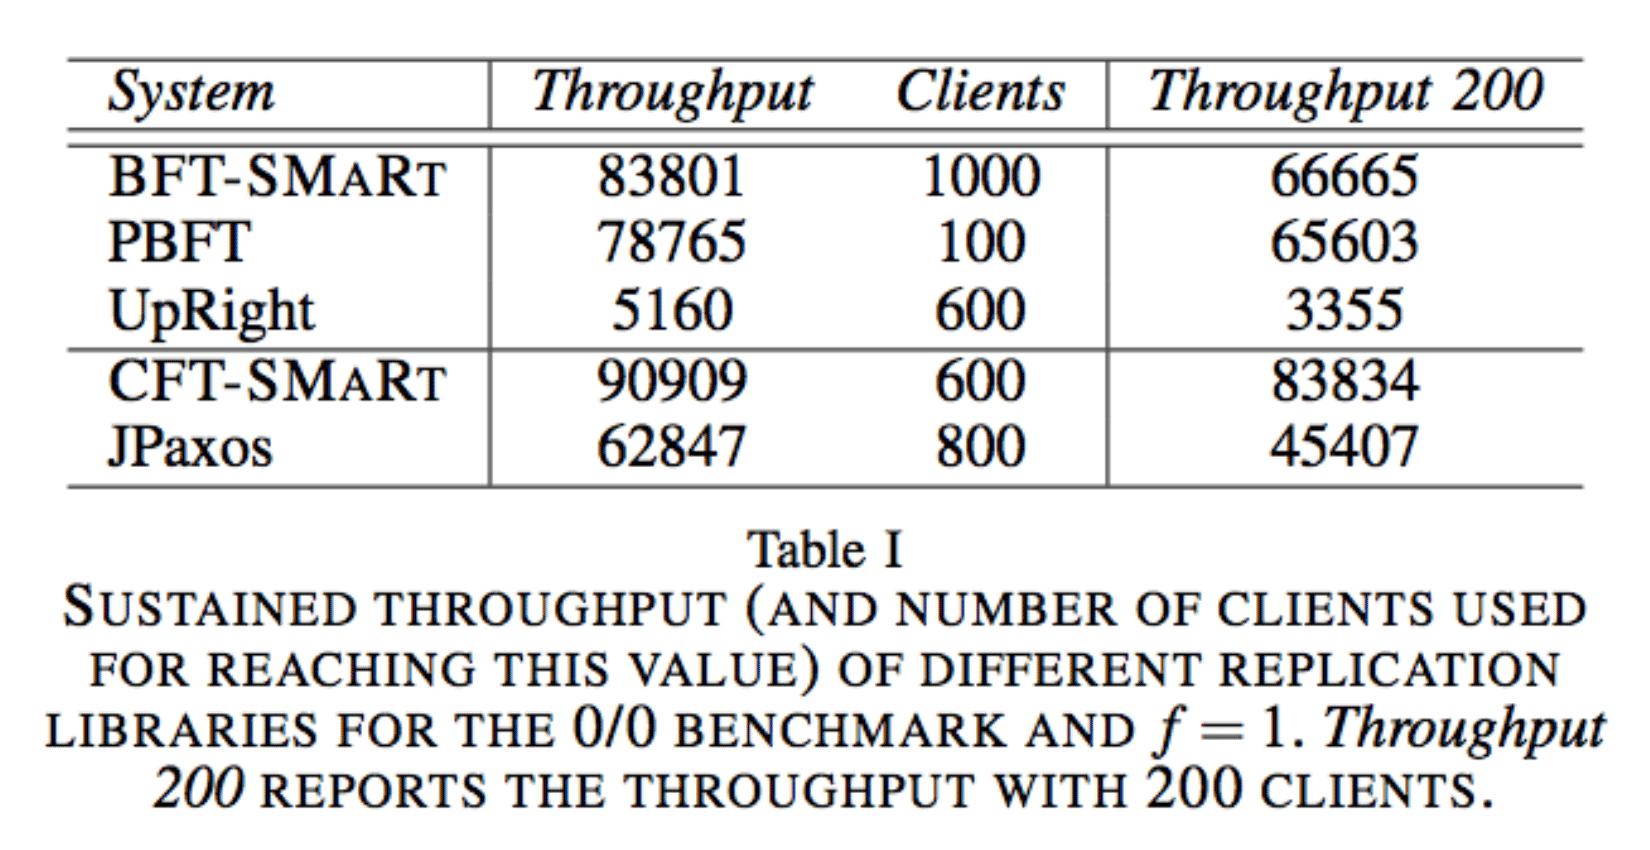 throughput_comparison.png